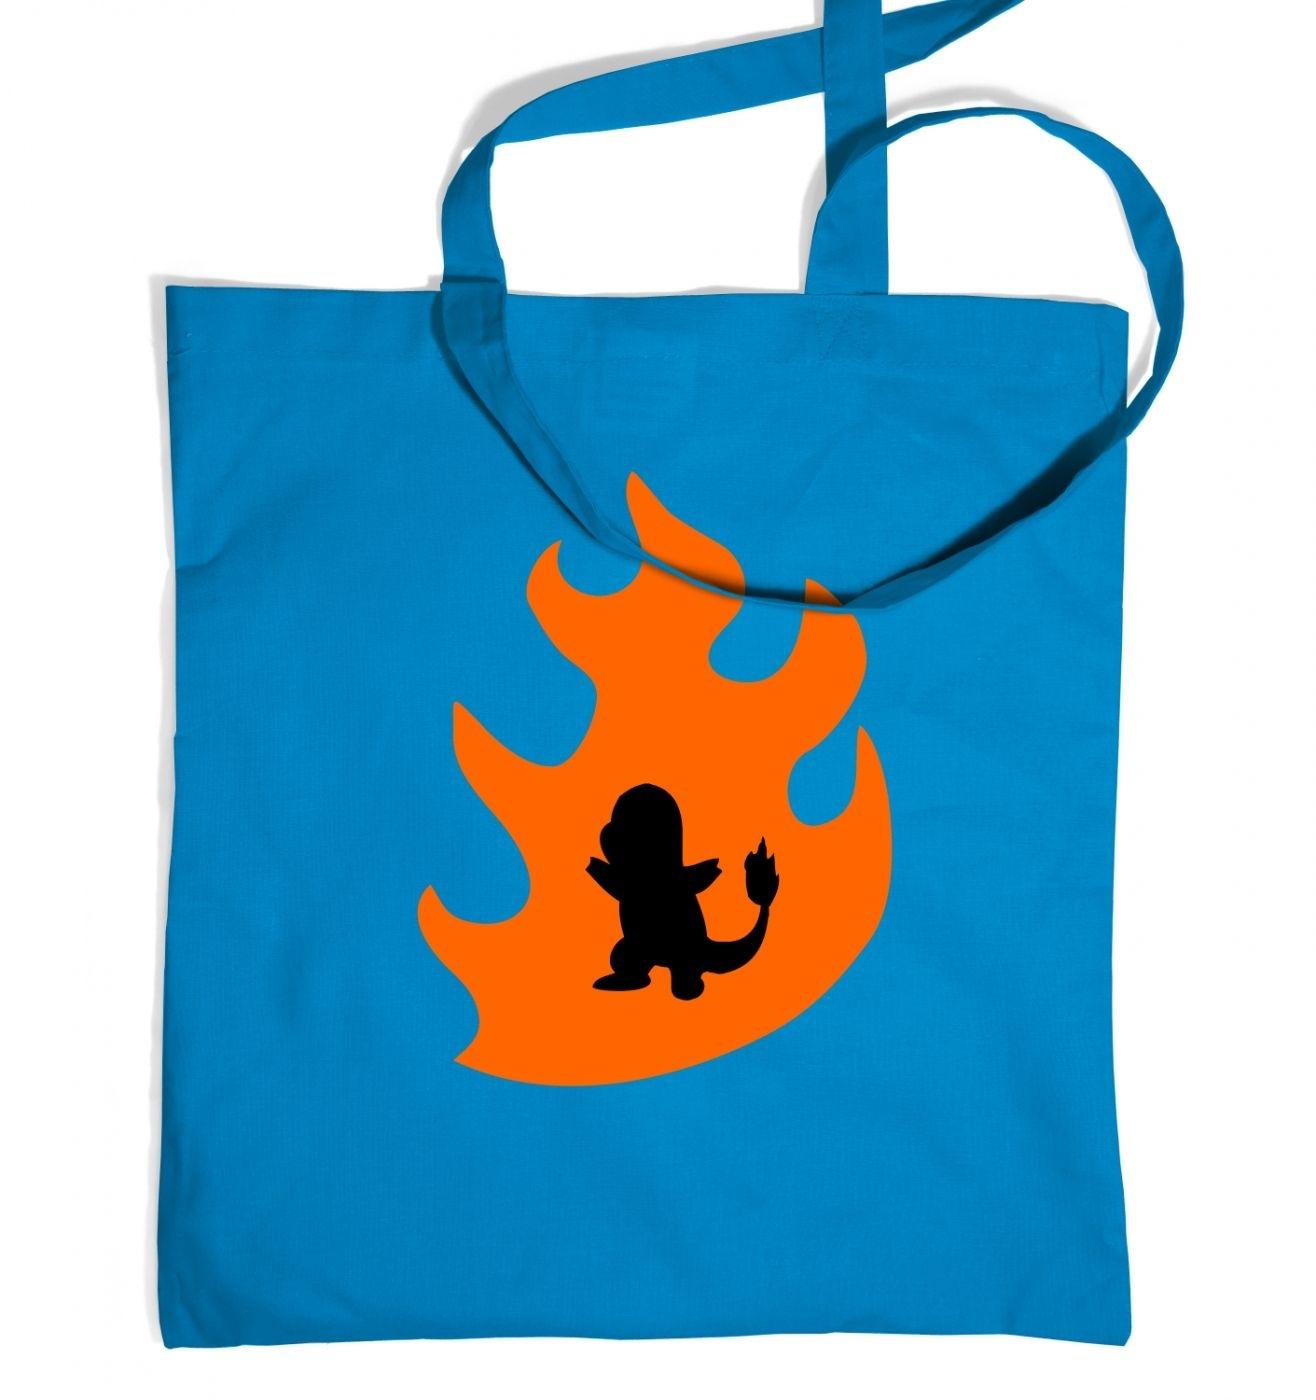 Orange Charmander Silhouette Tote Bag - Inspired by Pokemon